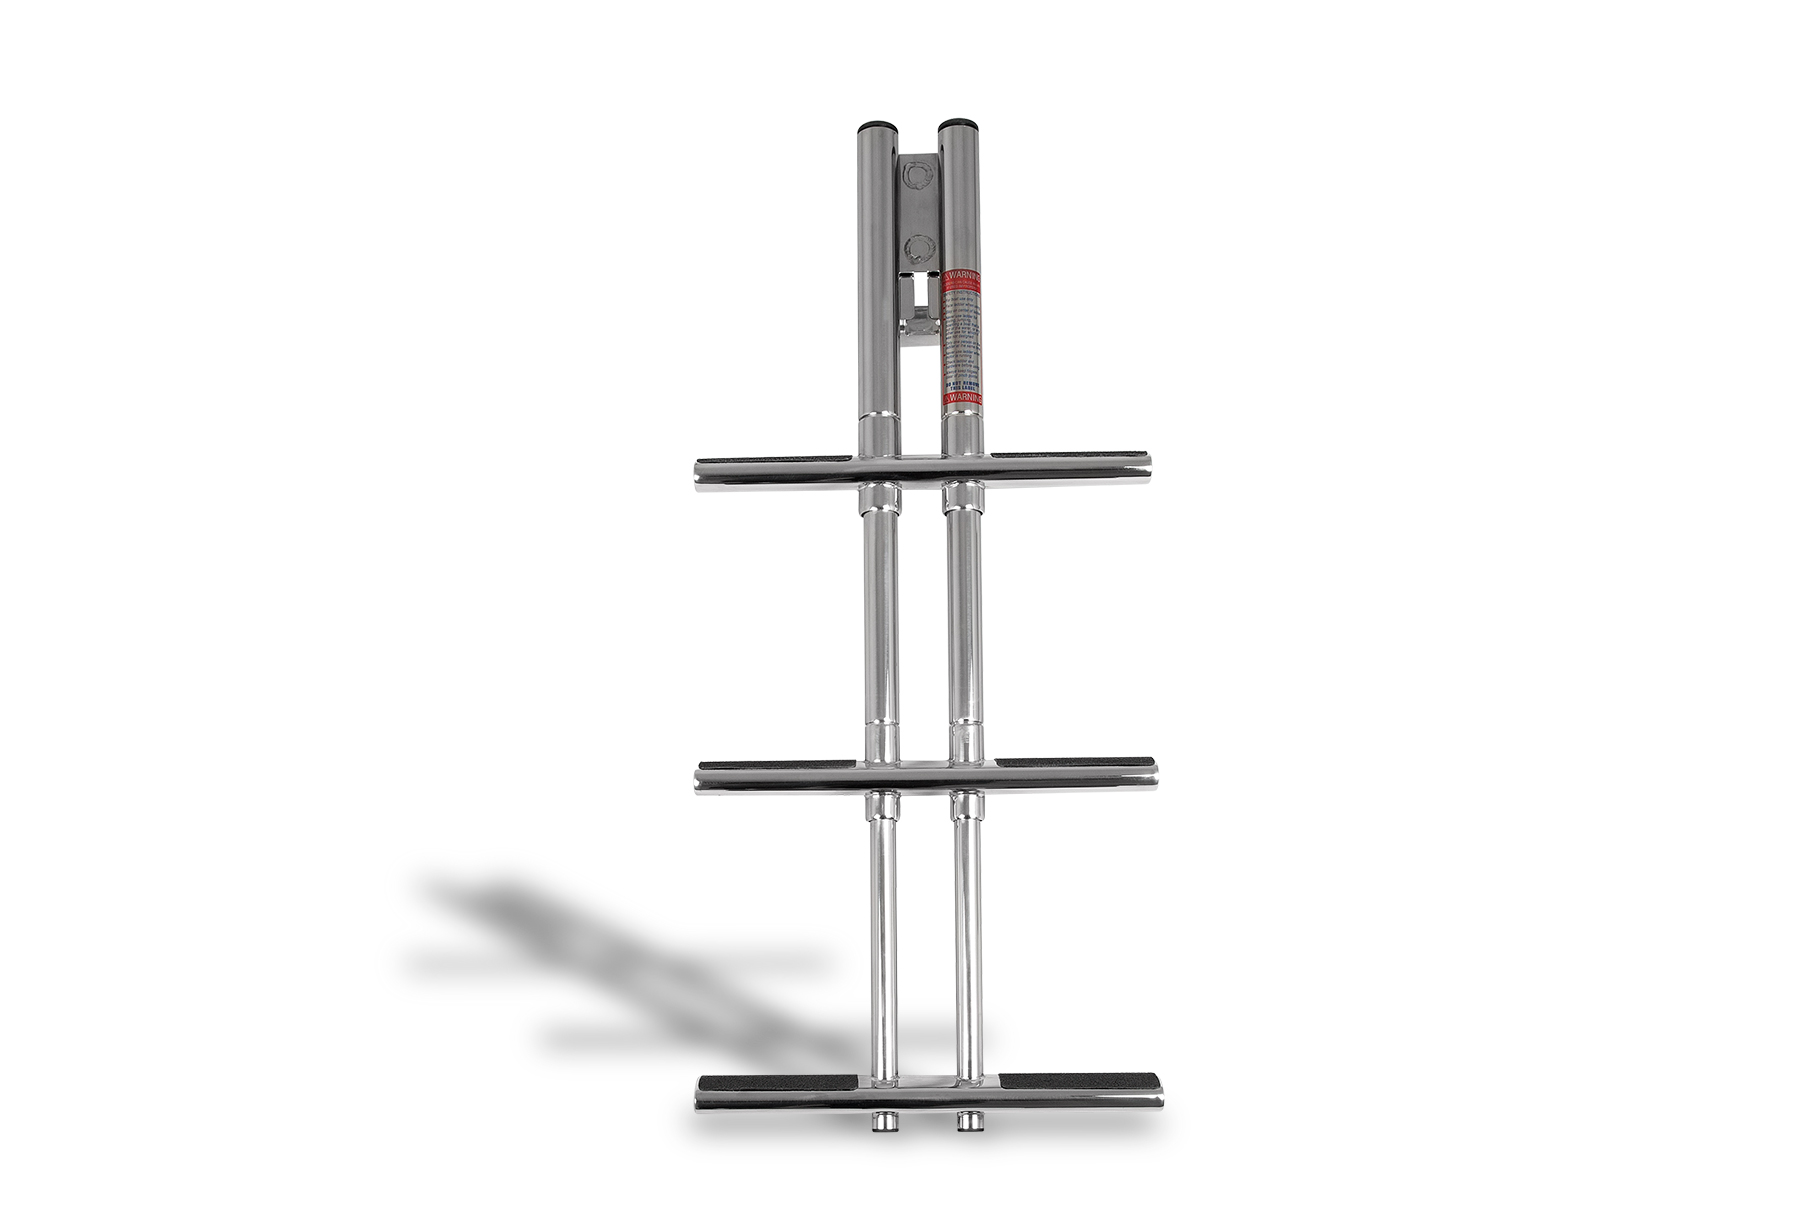 Compact_Ladder-2.jpg